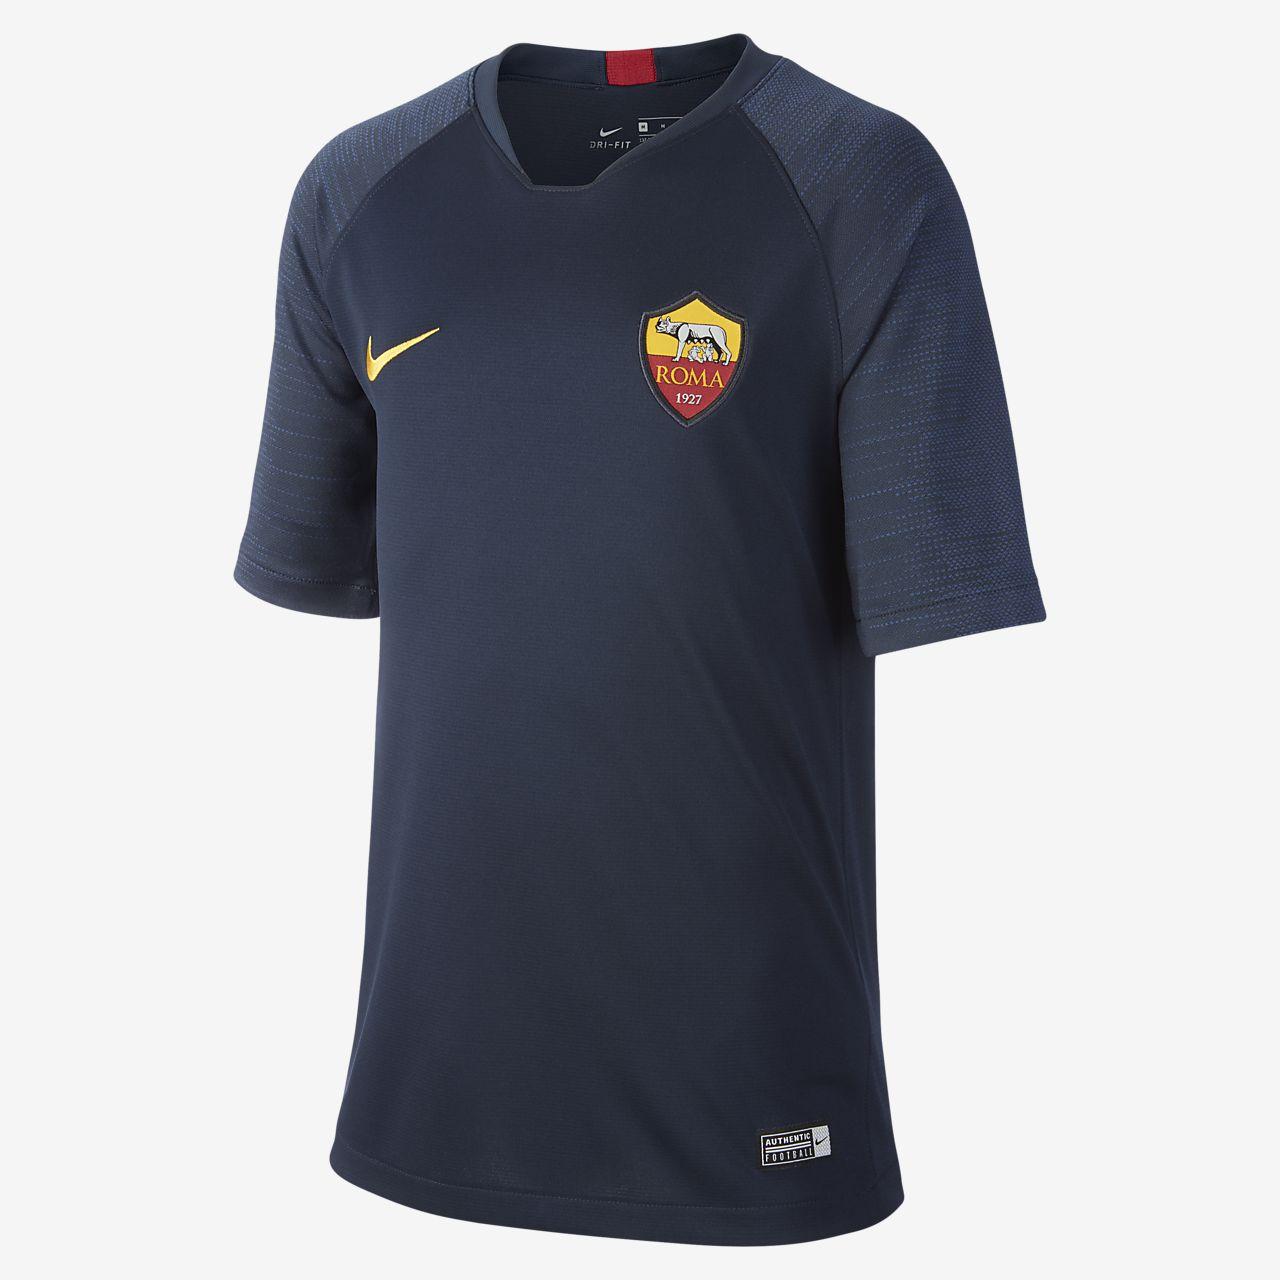 Camiseta de fútbol de manga corta para niños talla grande Nike Breathe A.S. Roma Strike